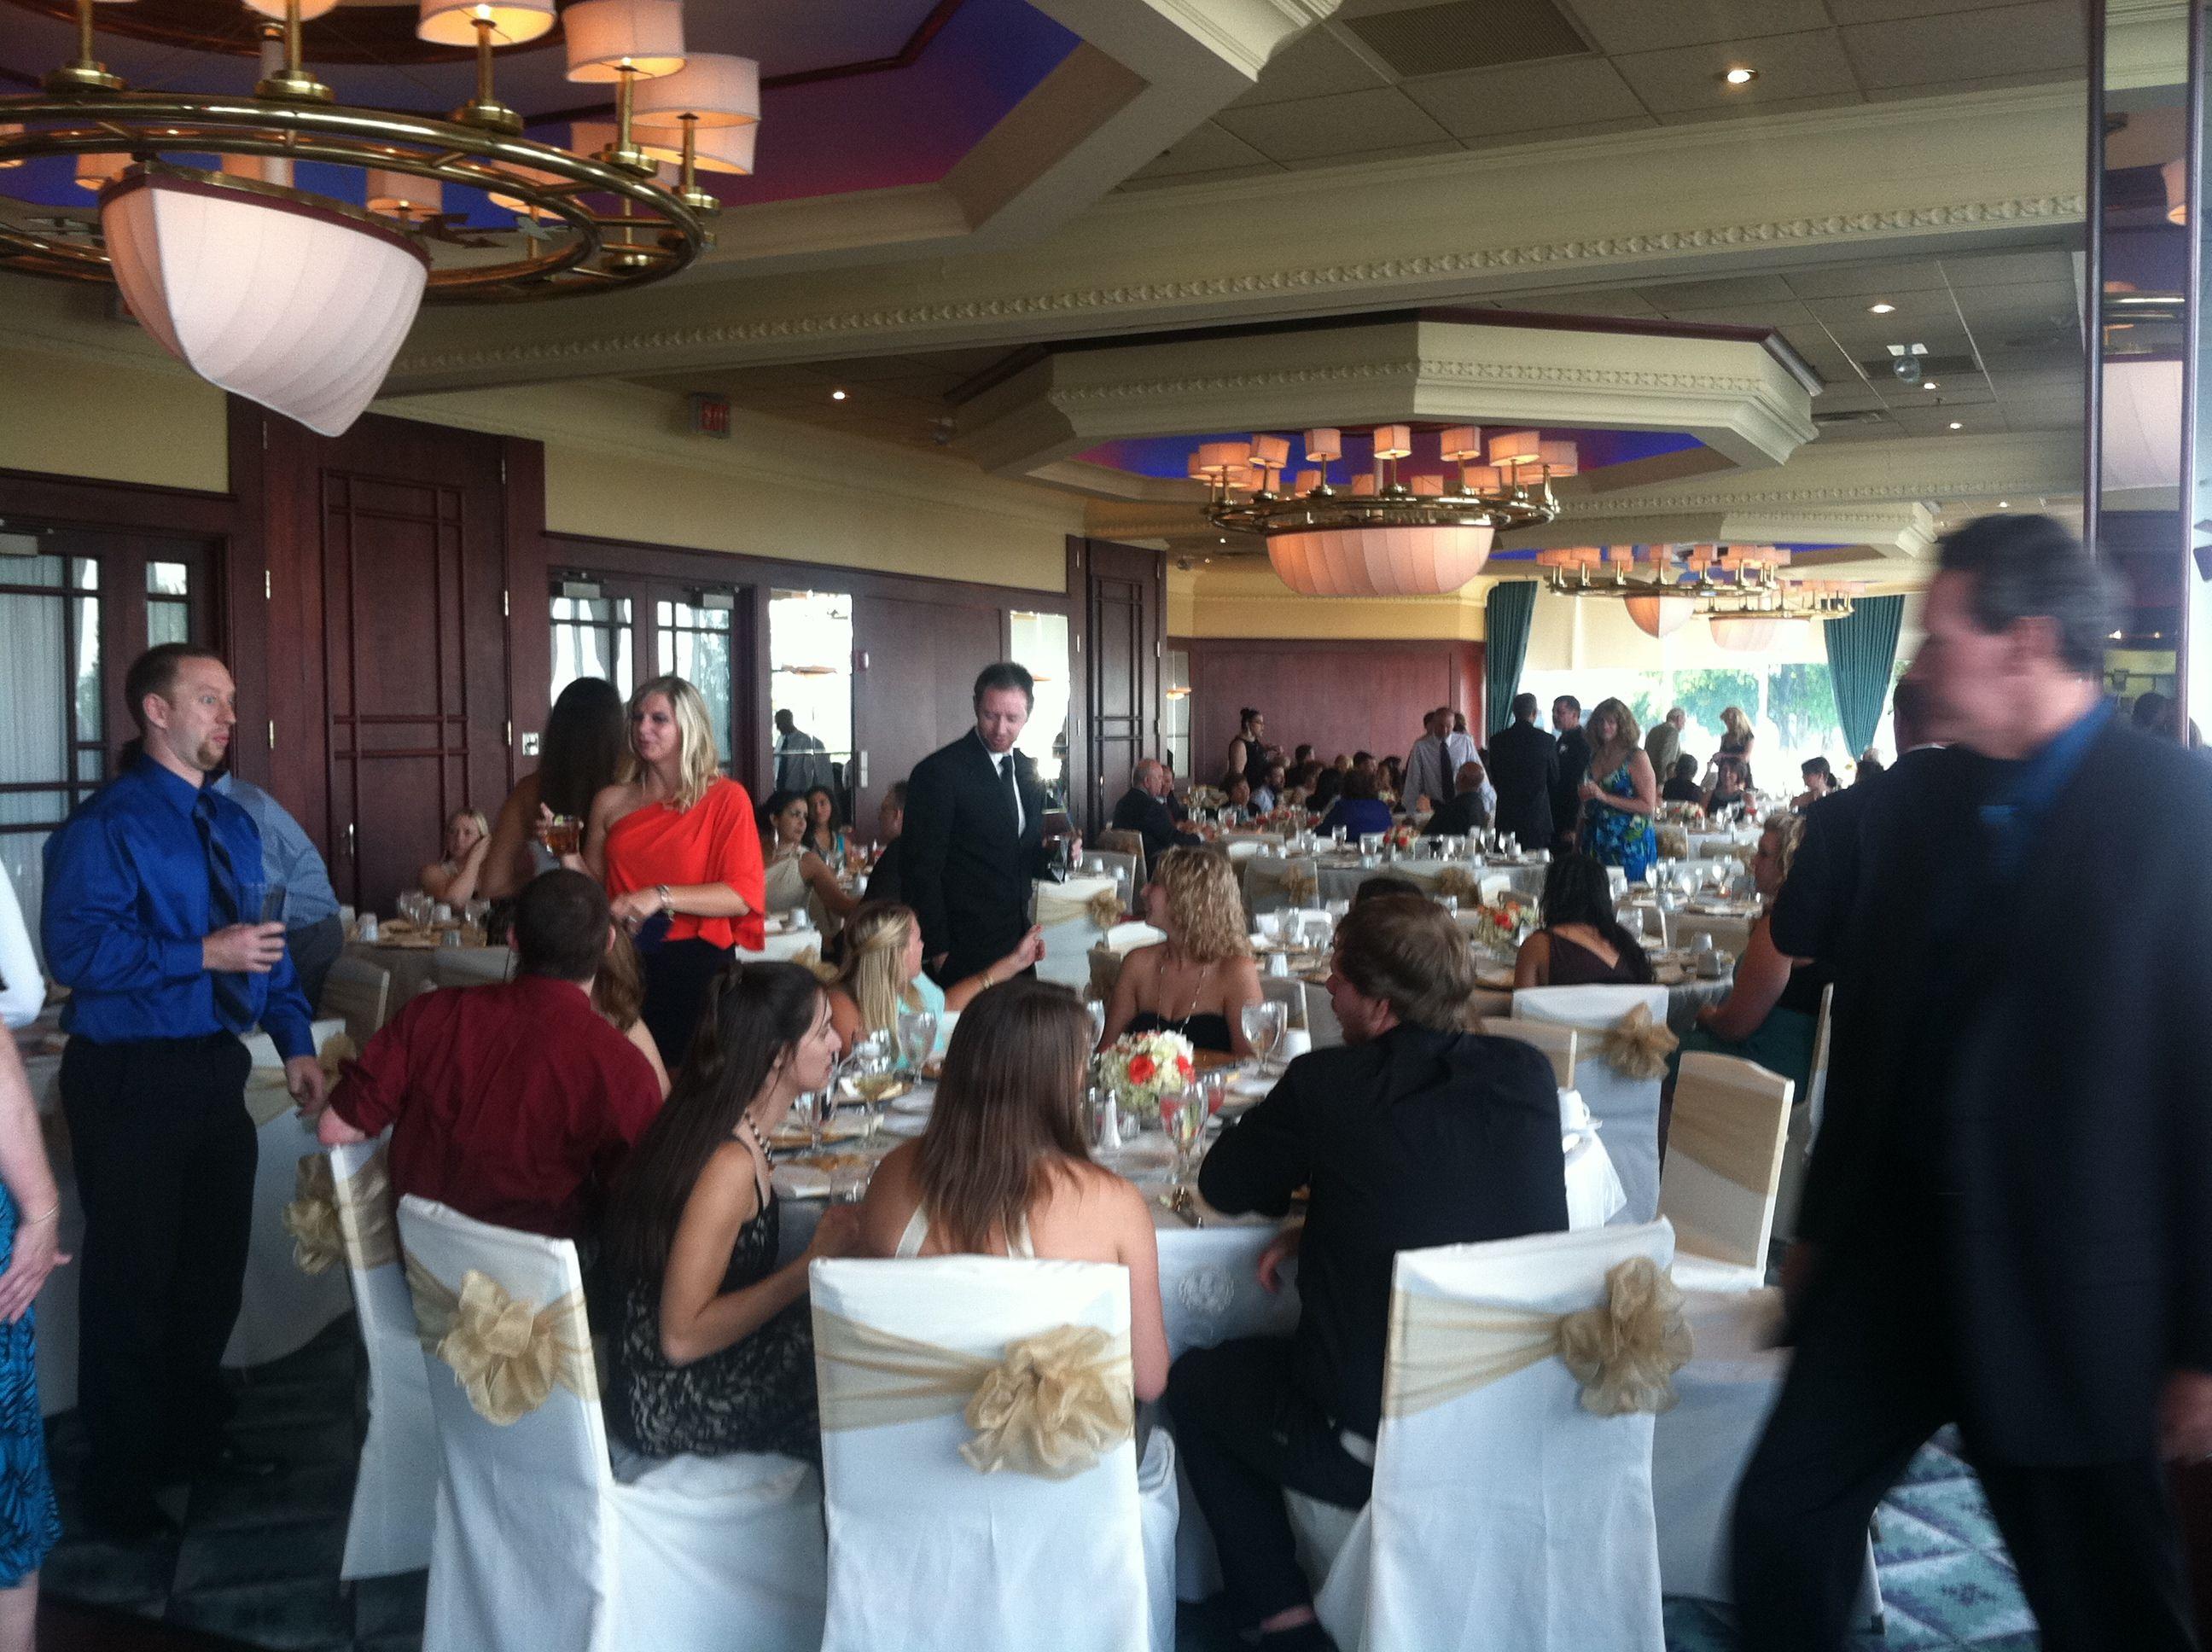 Commodore Ballroom Wedding August 2013.  MacRay Harbor The Banquet & Events Center